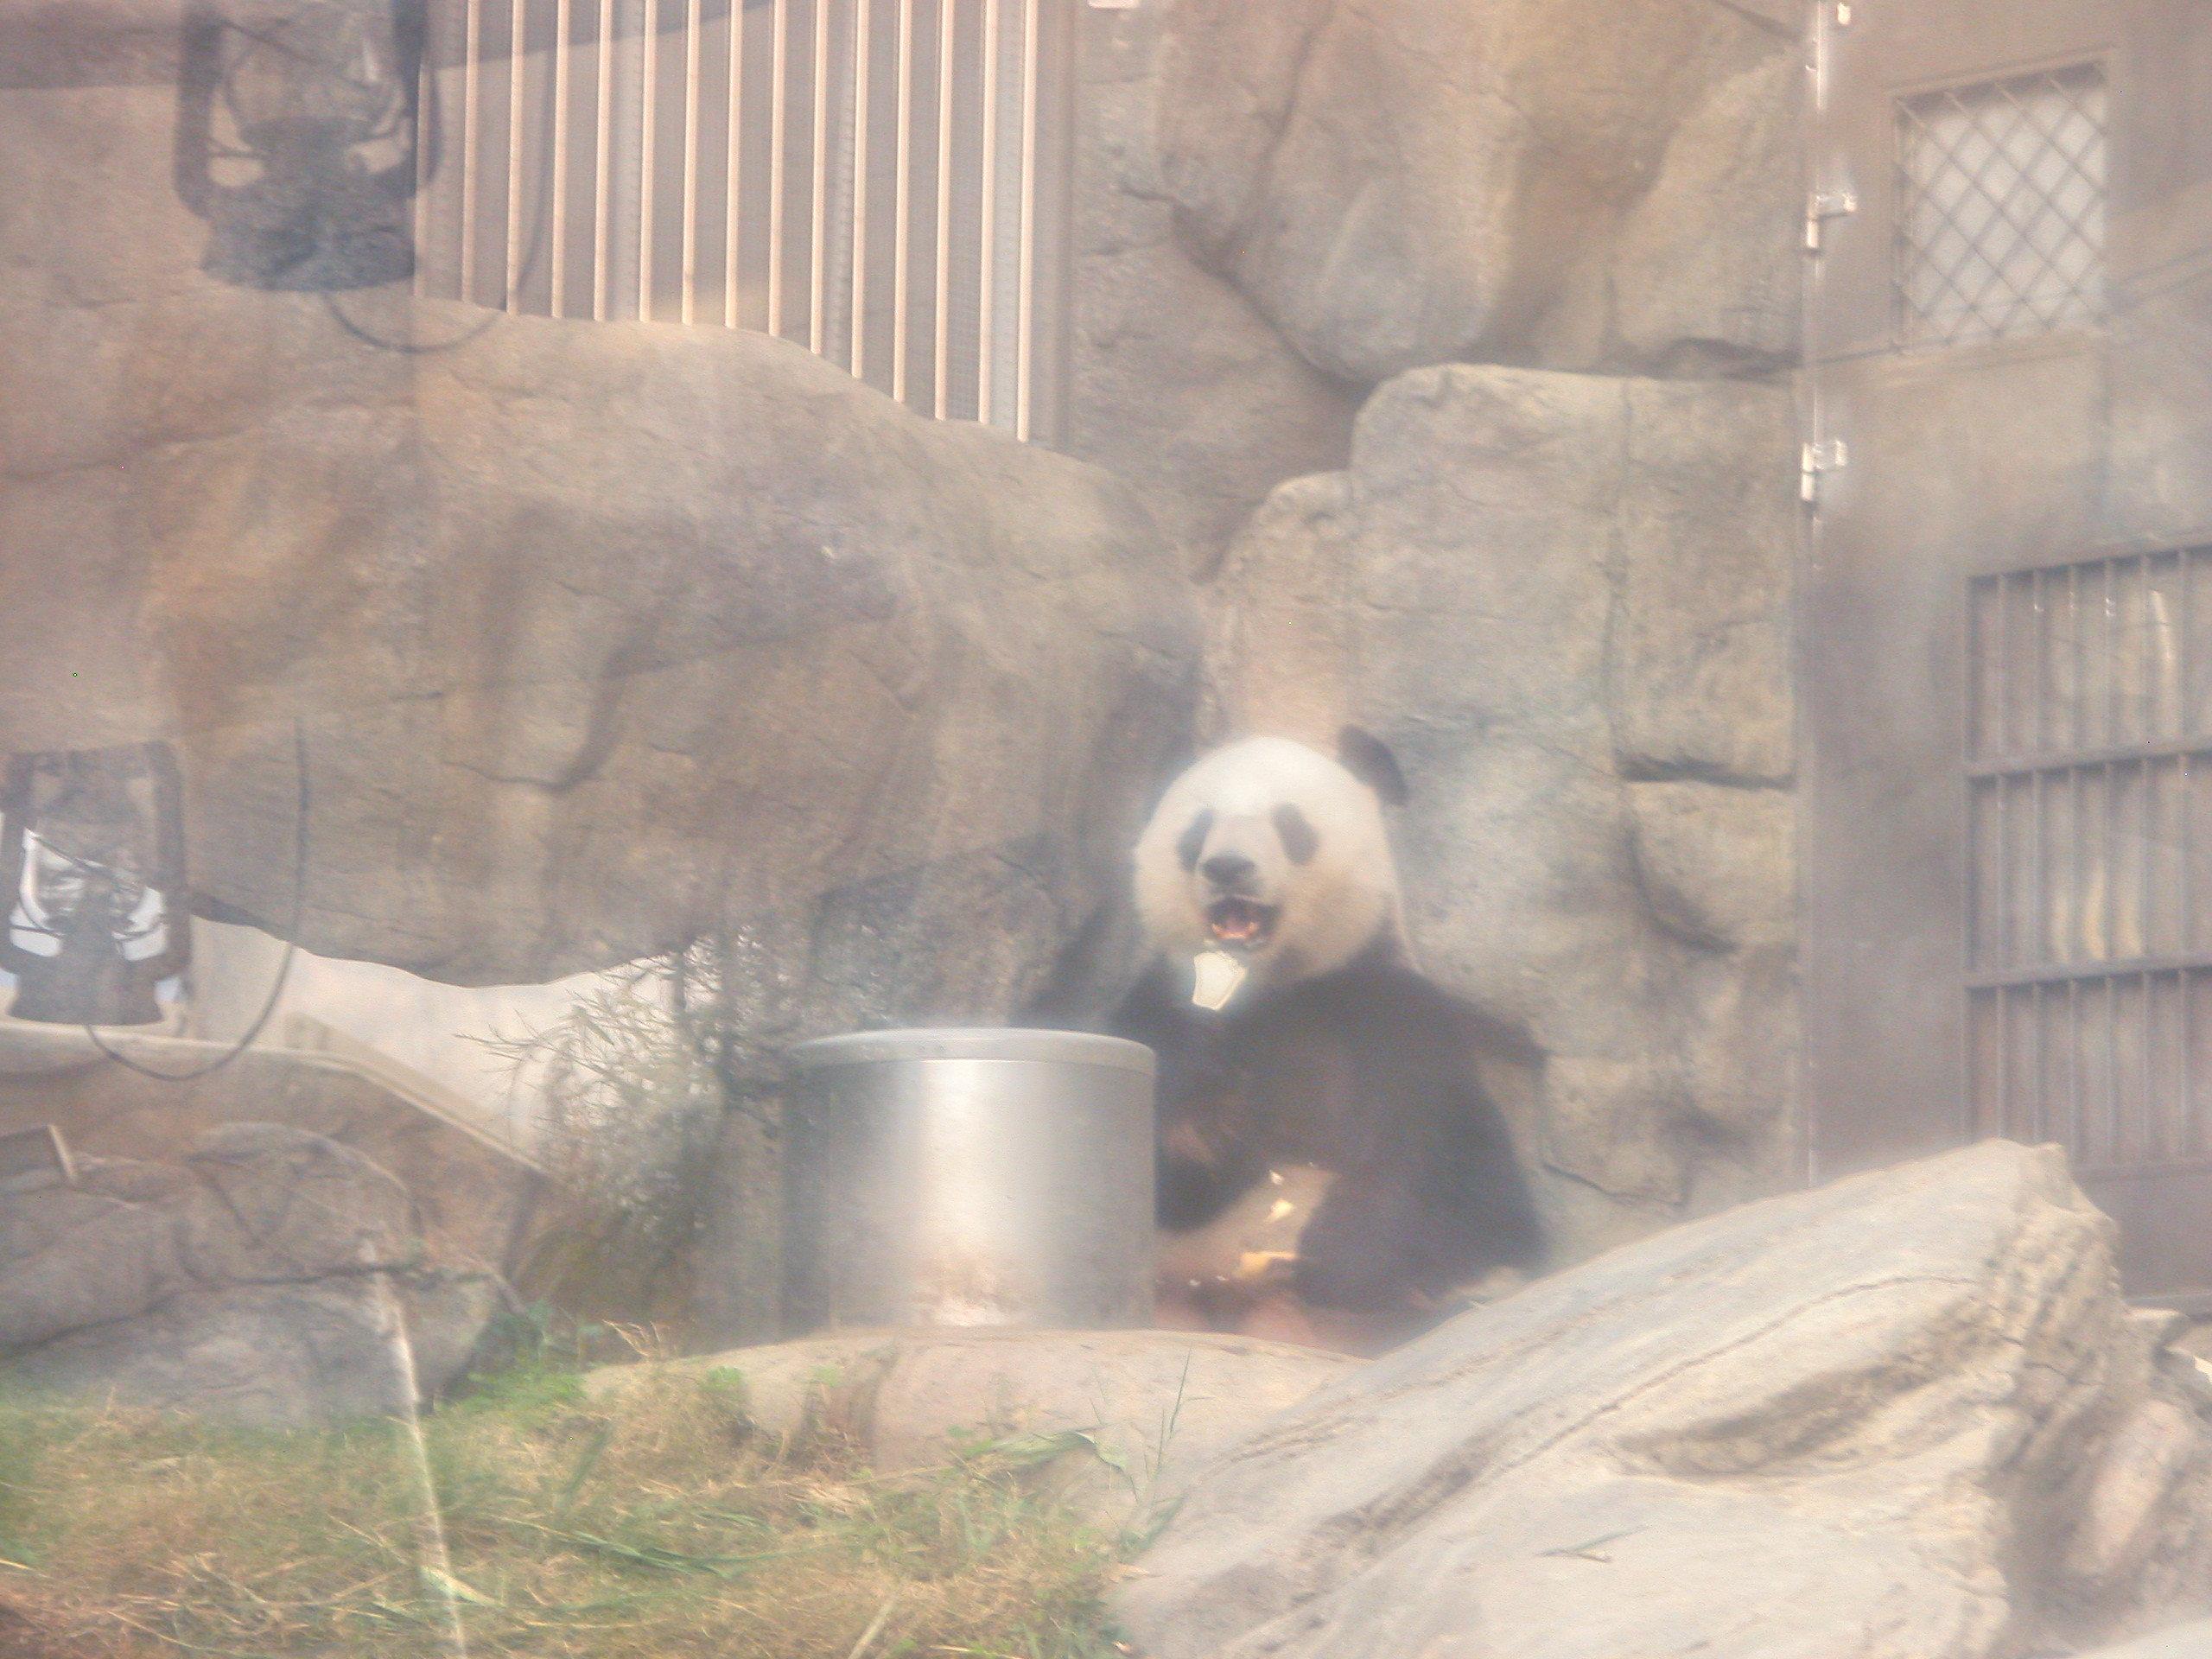 Ocean Park Panda Exhibit